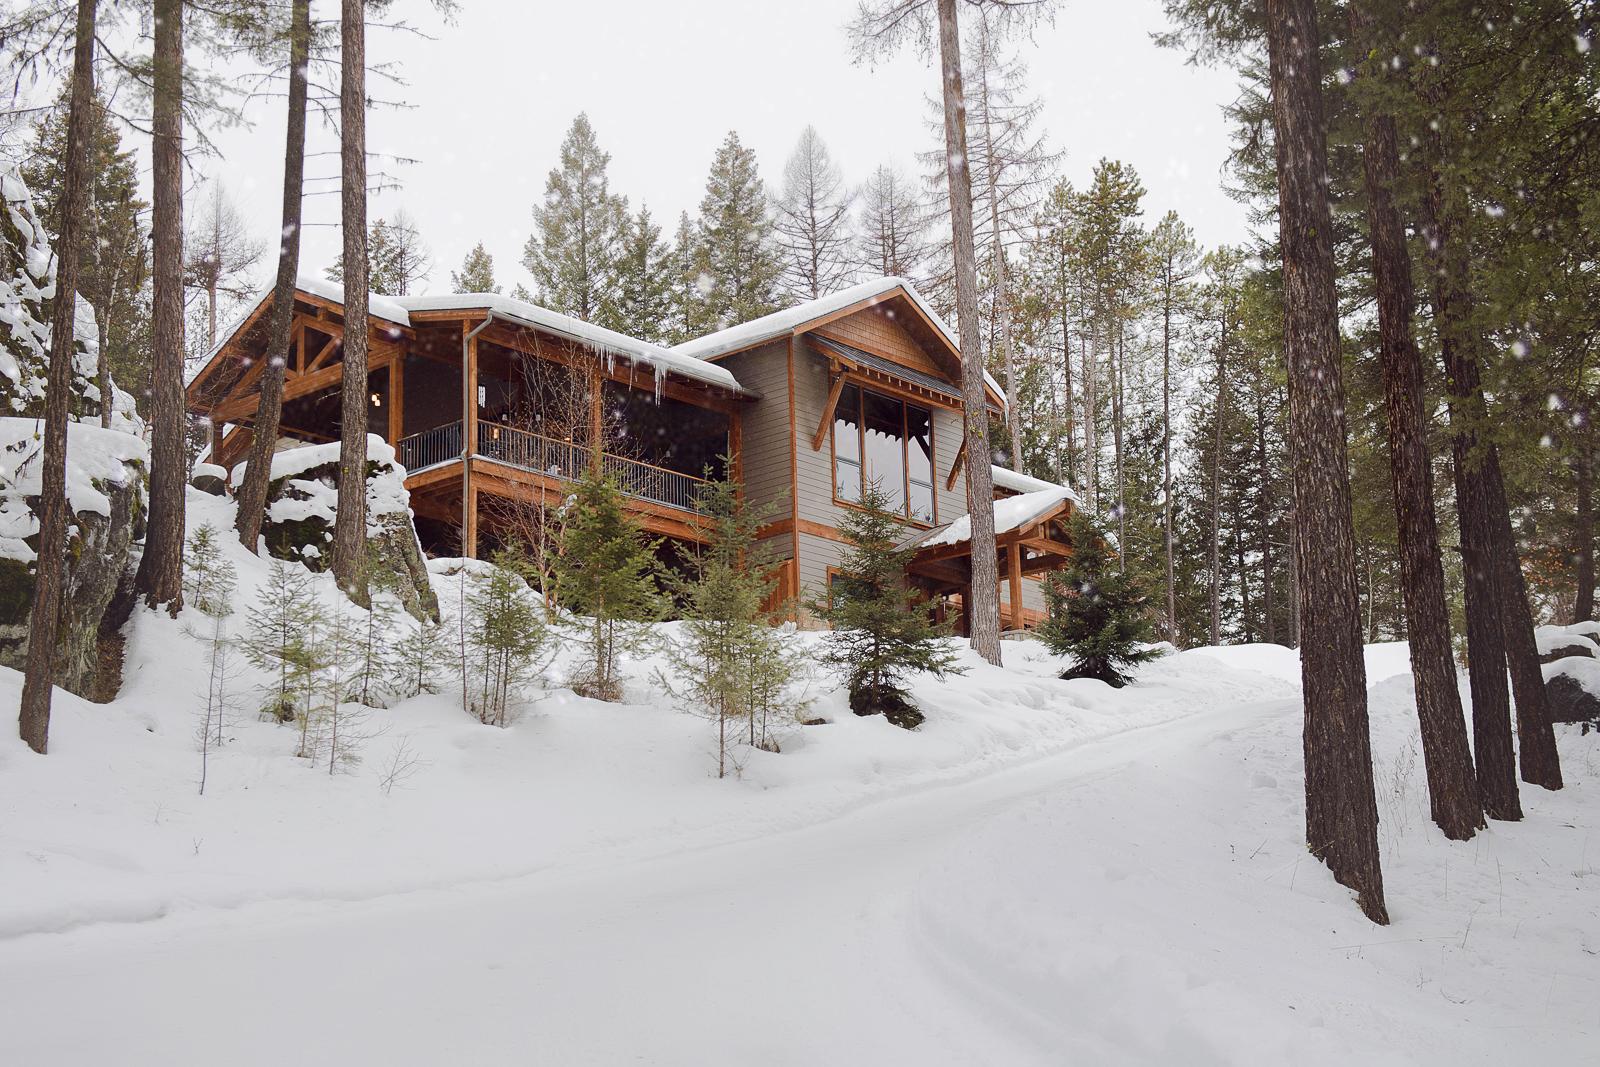 Woodworks-West-Bozeman-Montana-Builder-Cabinetry-Remodel-New-Construction-3726.jpg